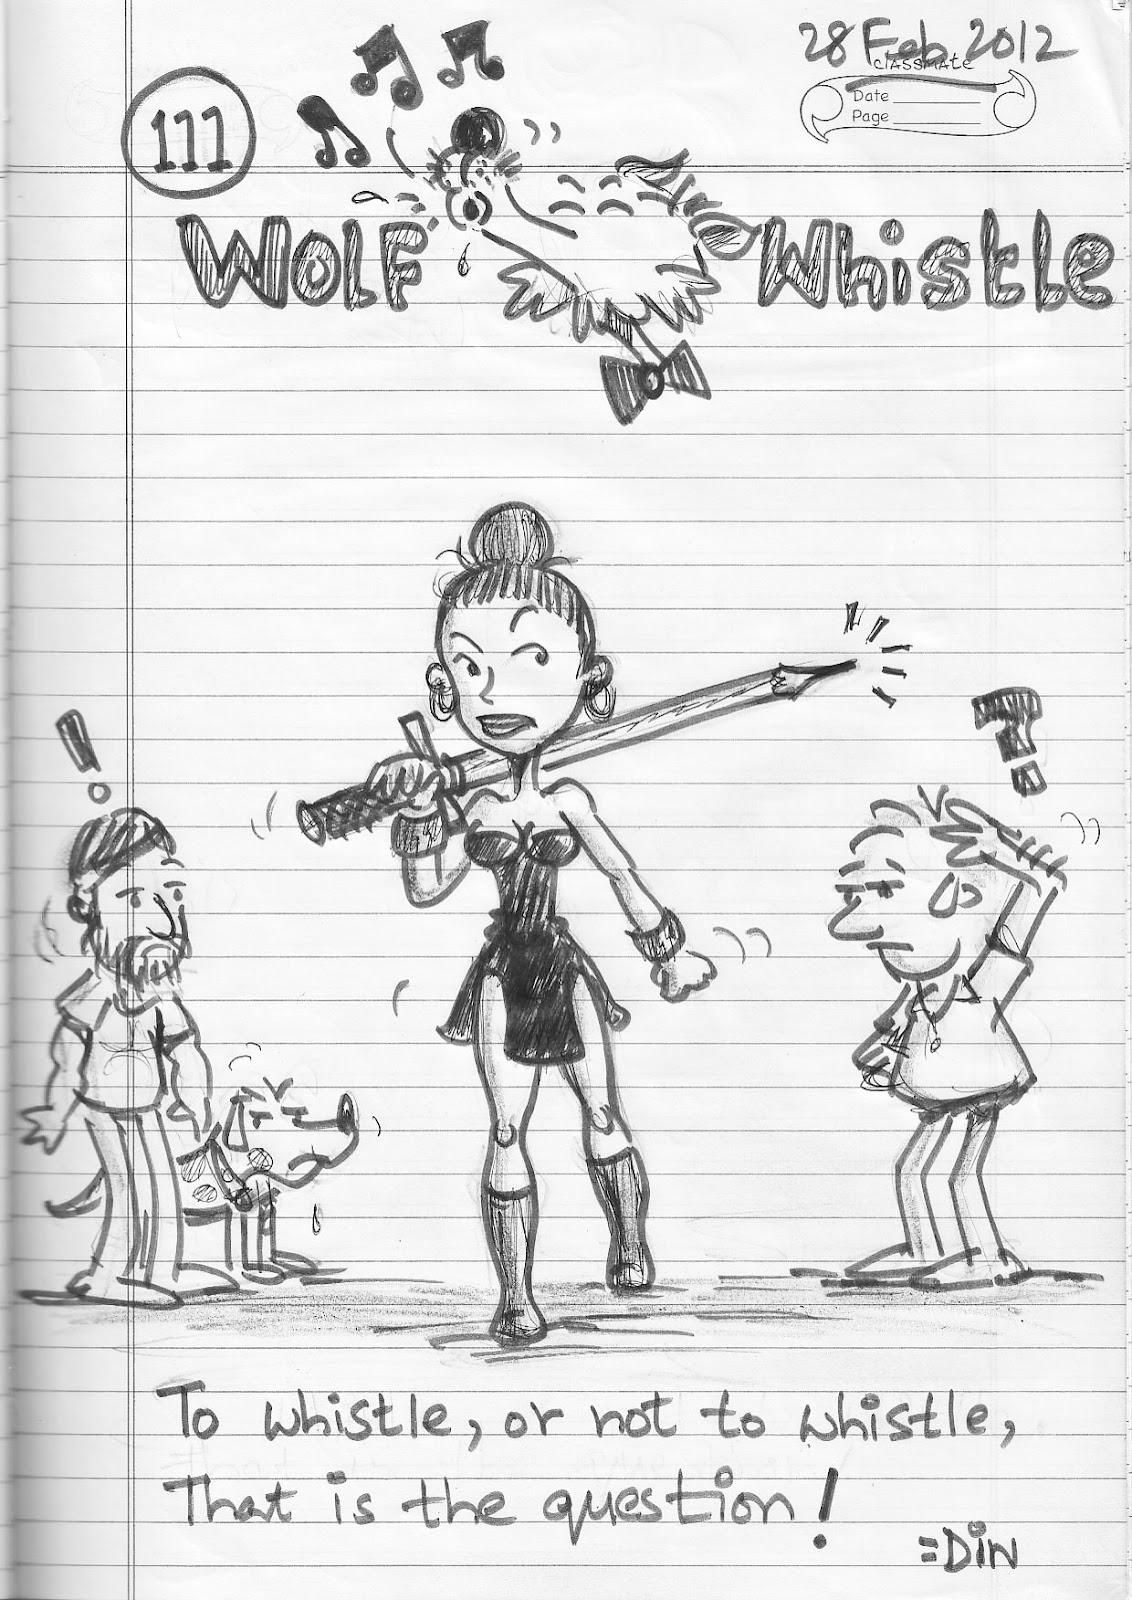 How do you write a wolf whistle? Like how do you write how it sounds lol?